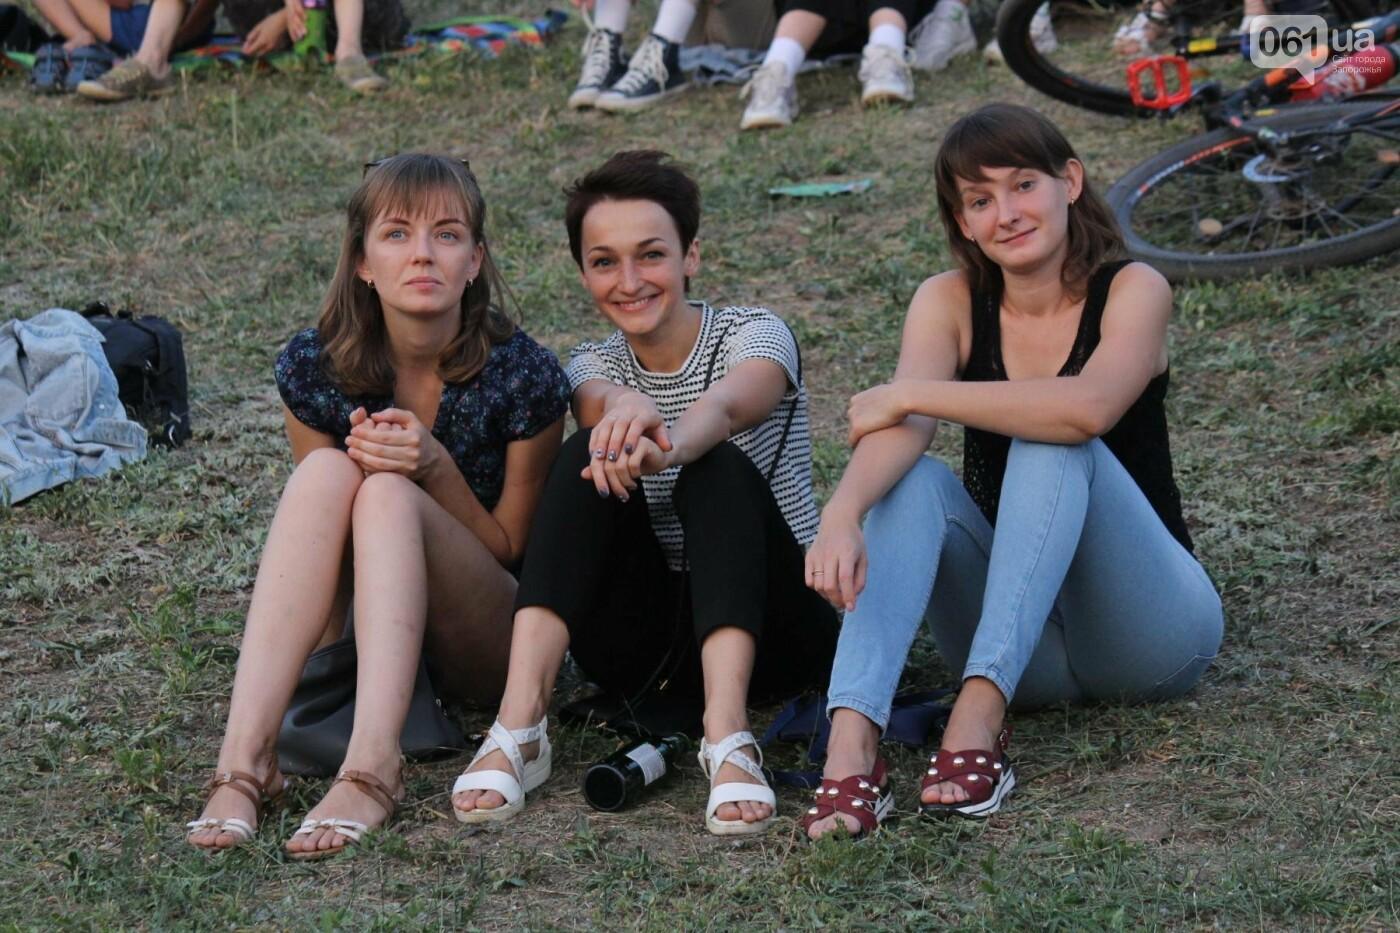 Найди себя: 50 портретов посетителей фестиваля Khortytsia Freedom, – ФОТОРЕПОРТАЖ, фото-50